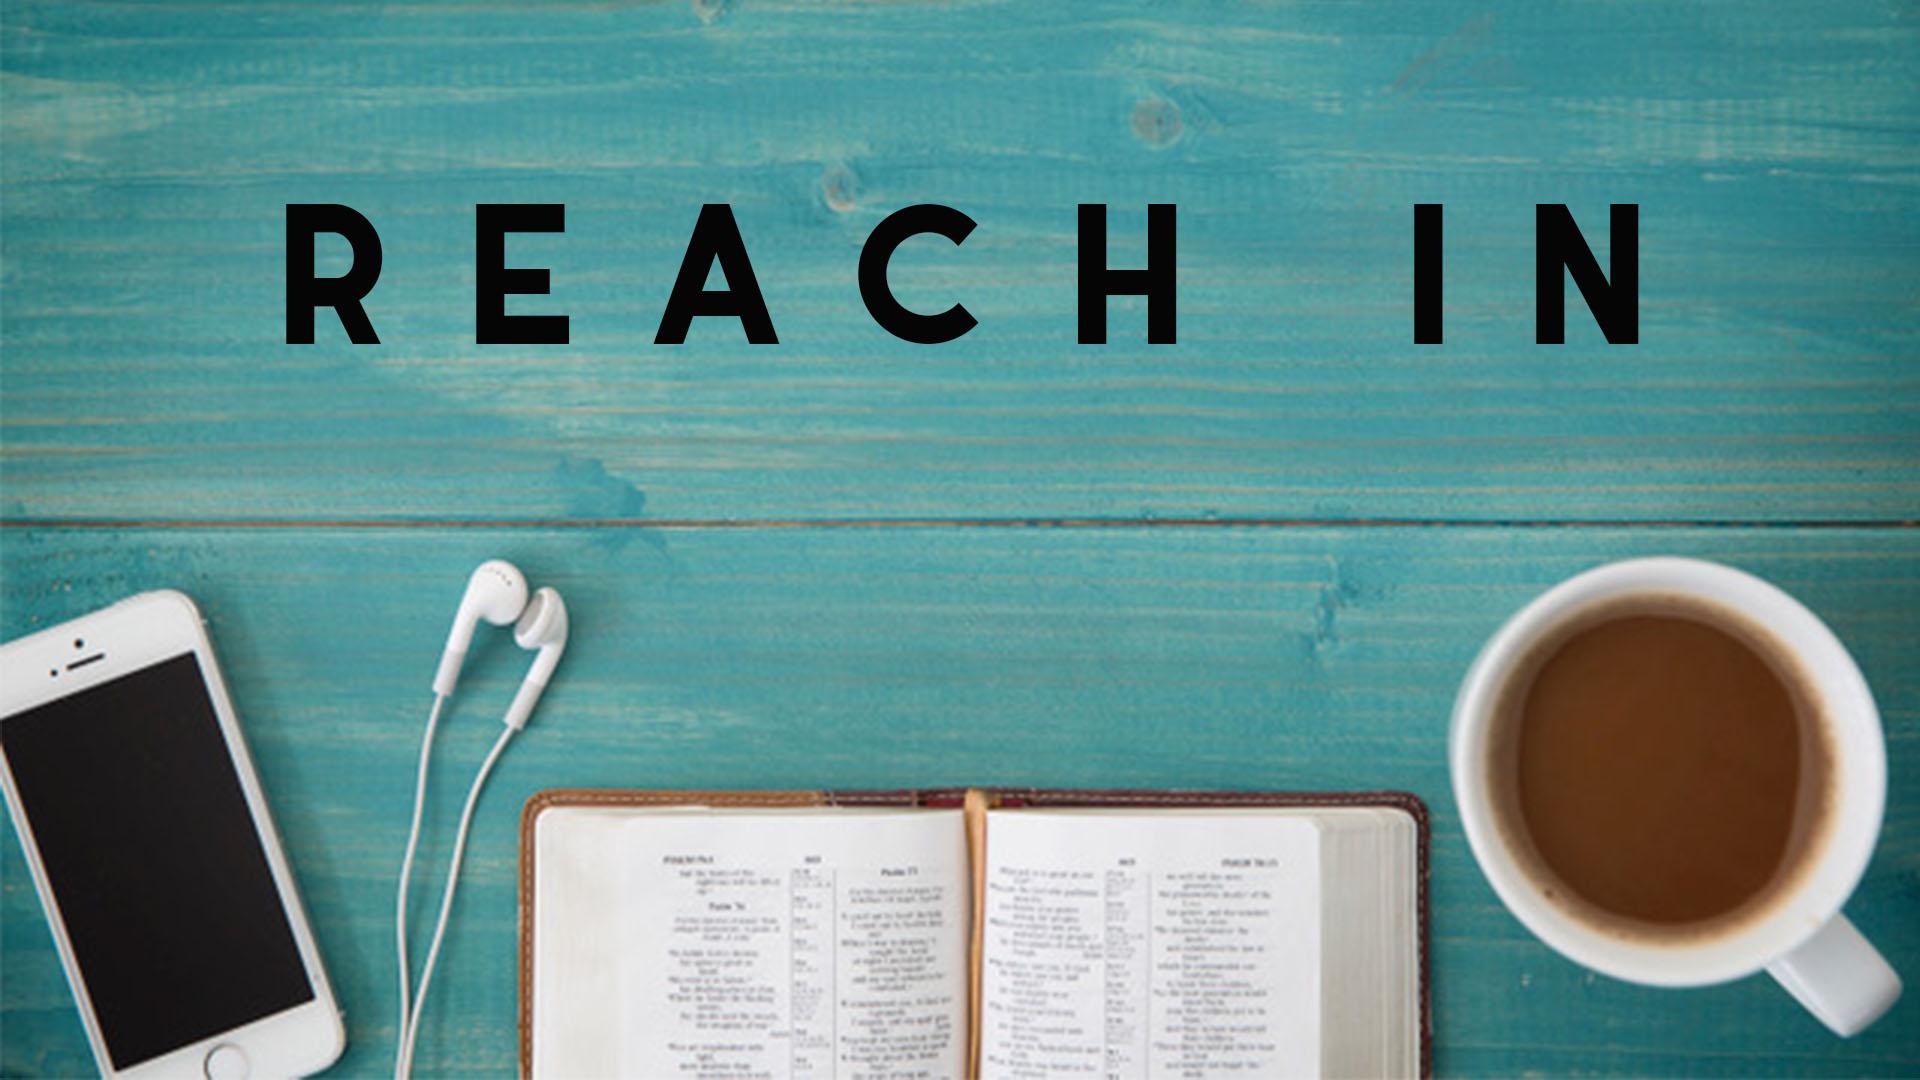 Reach in.jpg